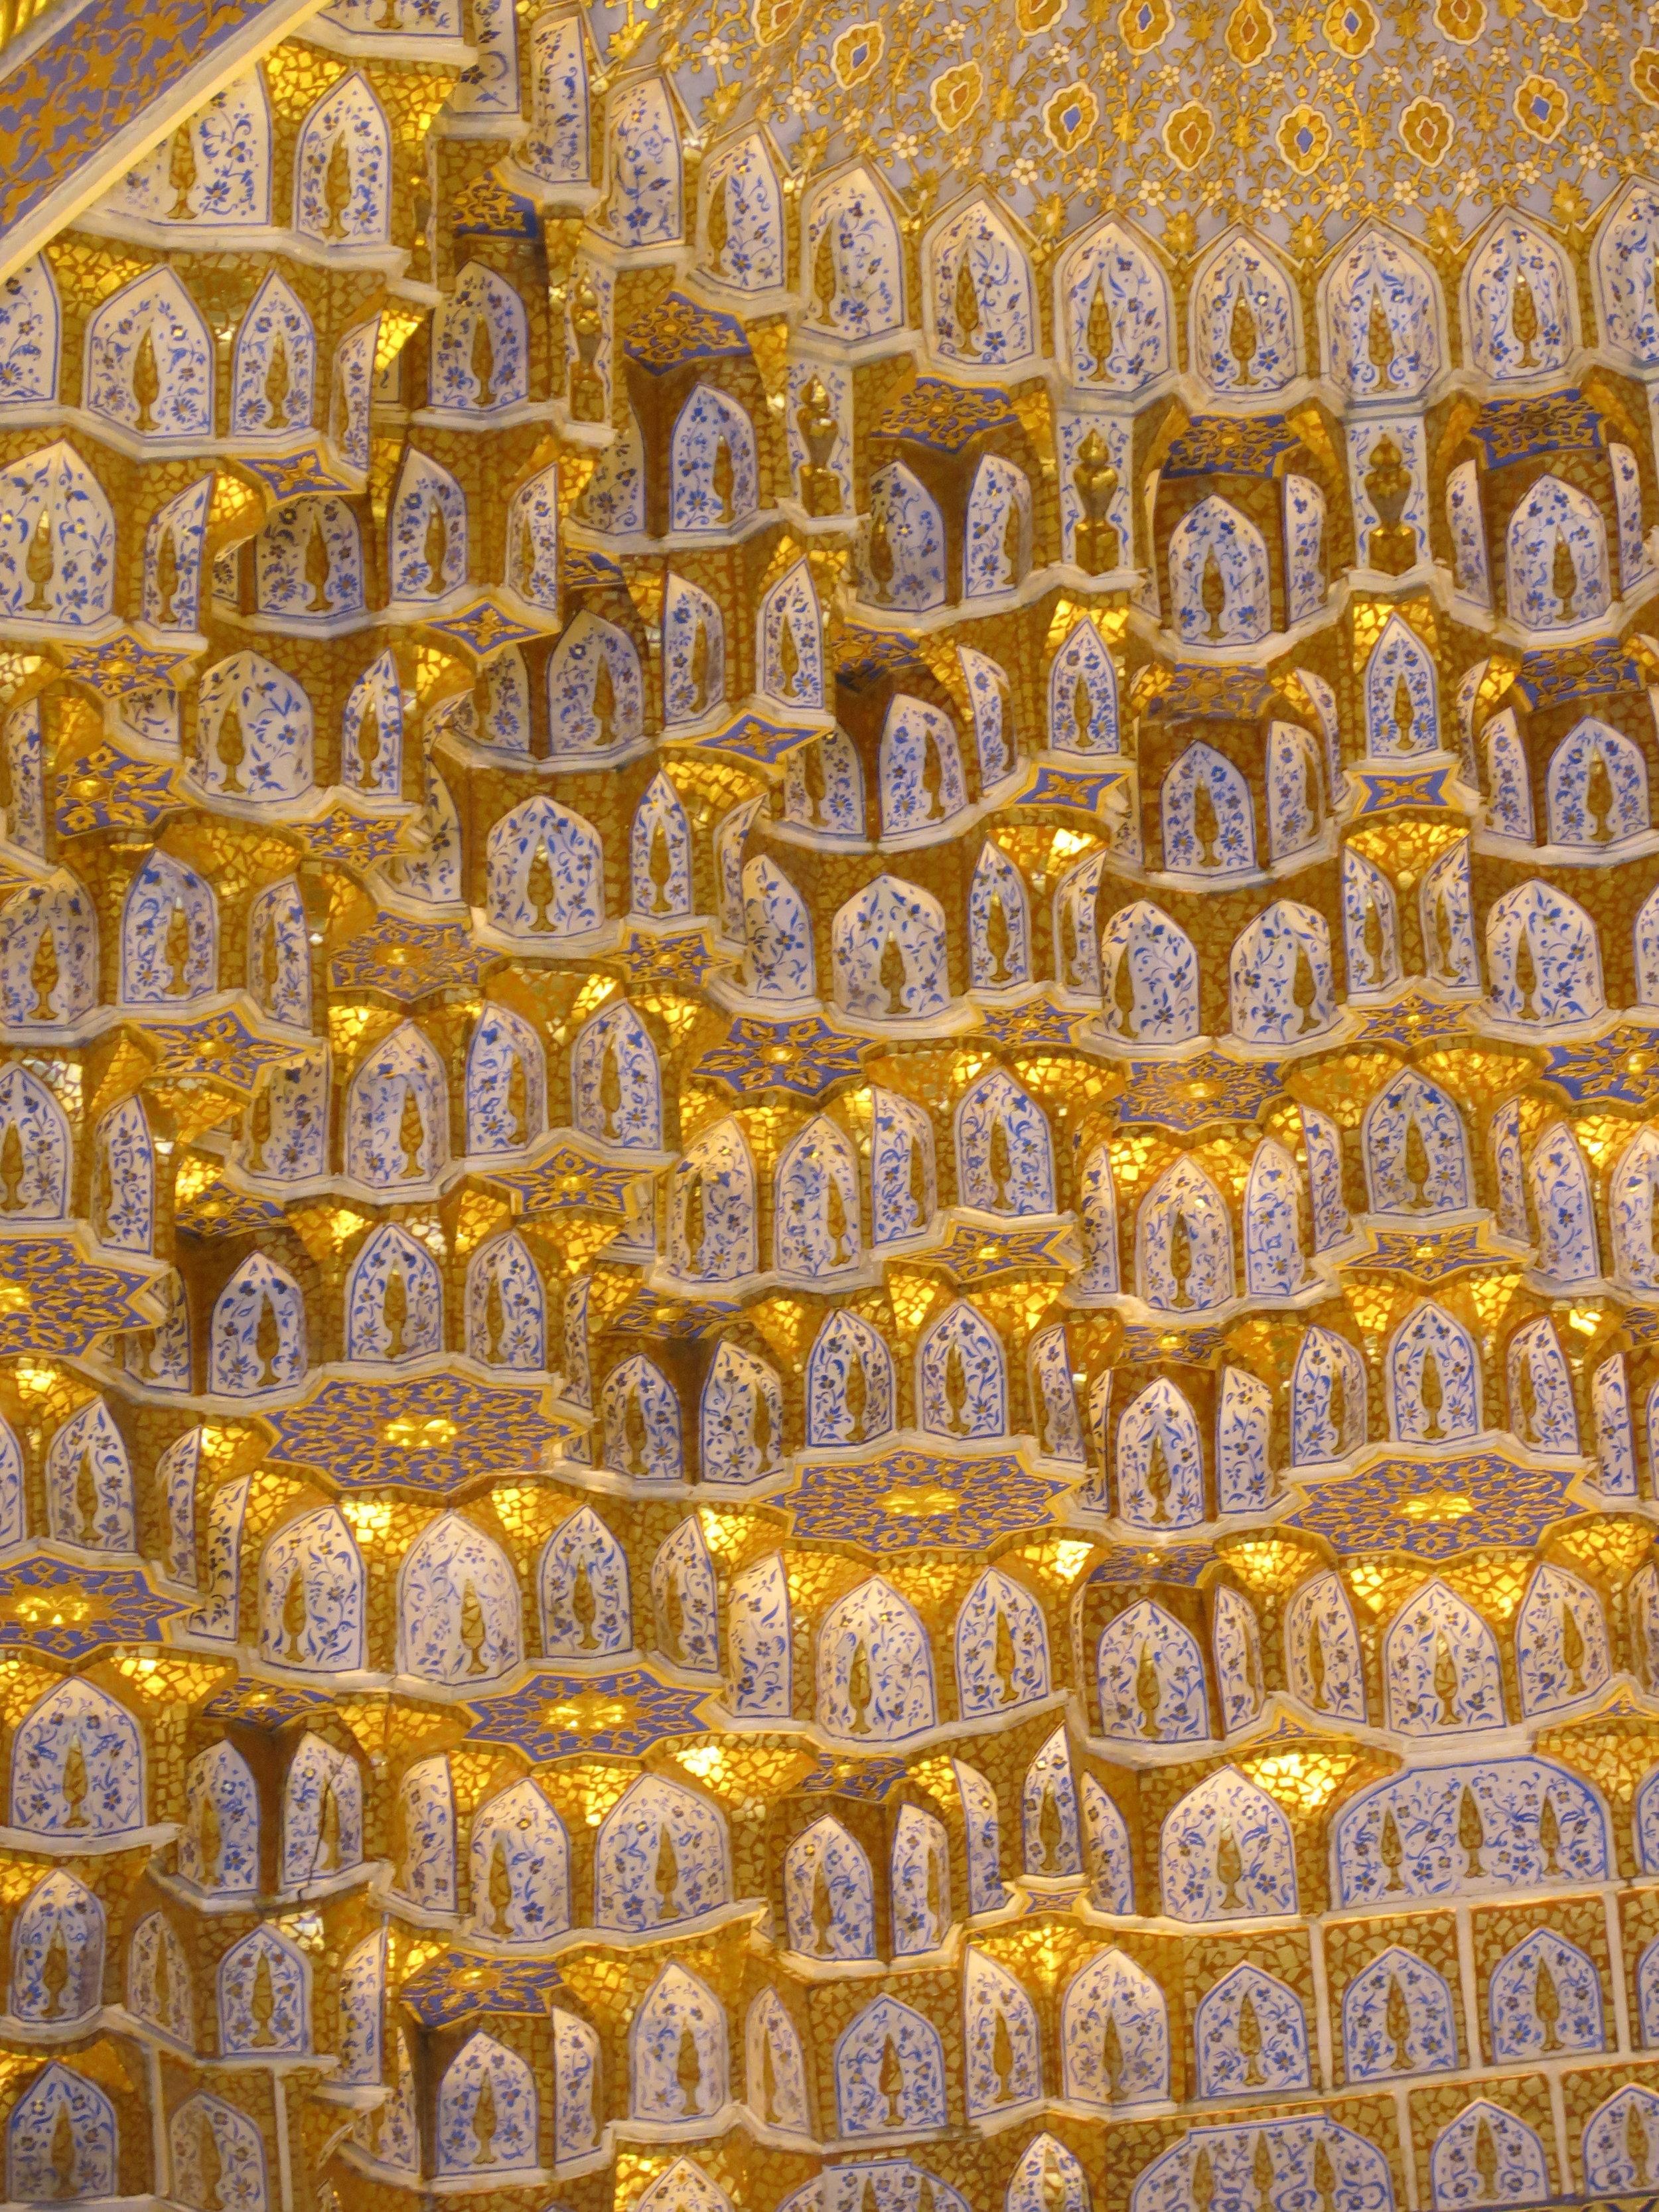 Golden ornamented vaulting called muqarnas